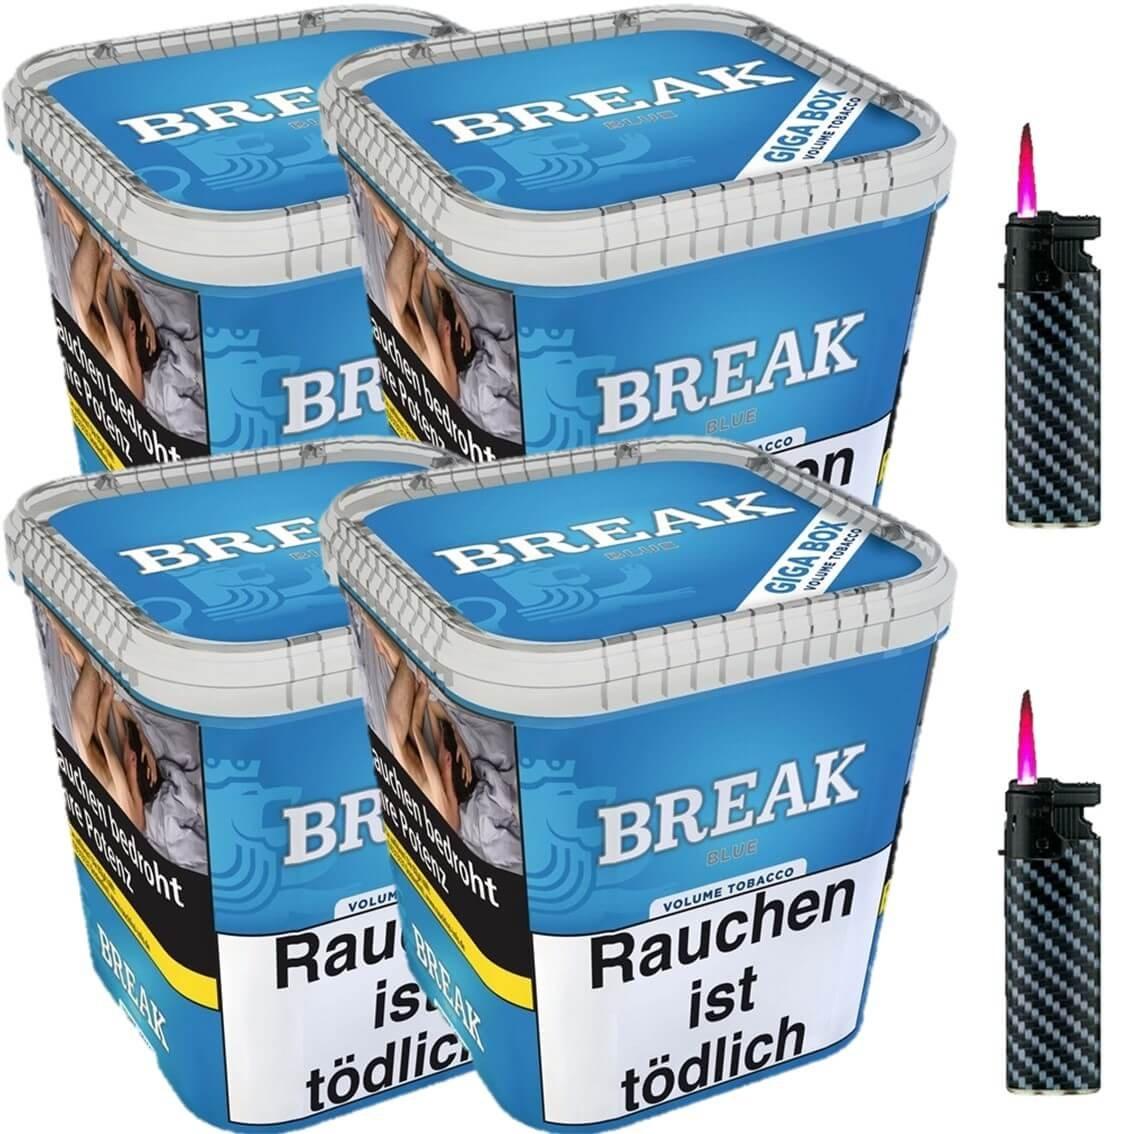 Break Blue / Blau 4 x 230g Volumentabak 2 x Sturmfeuerzeuge